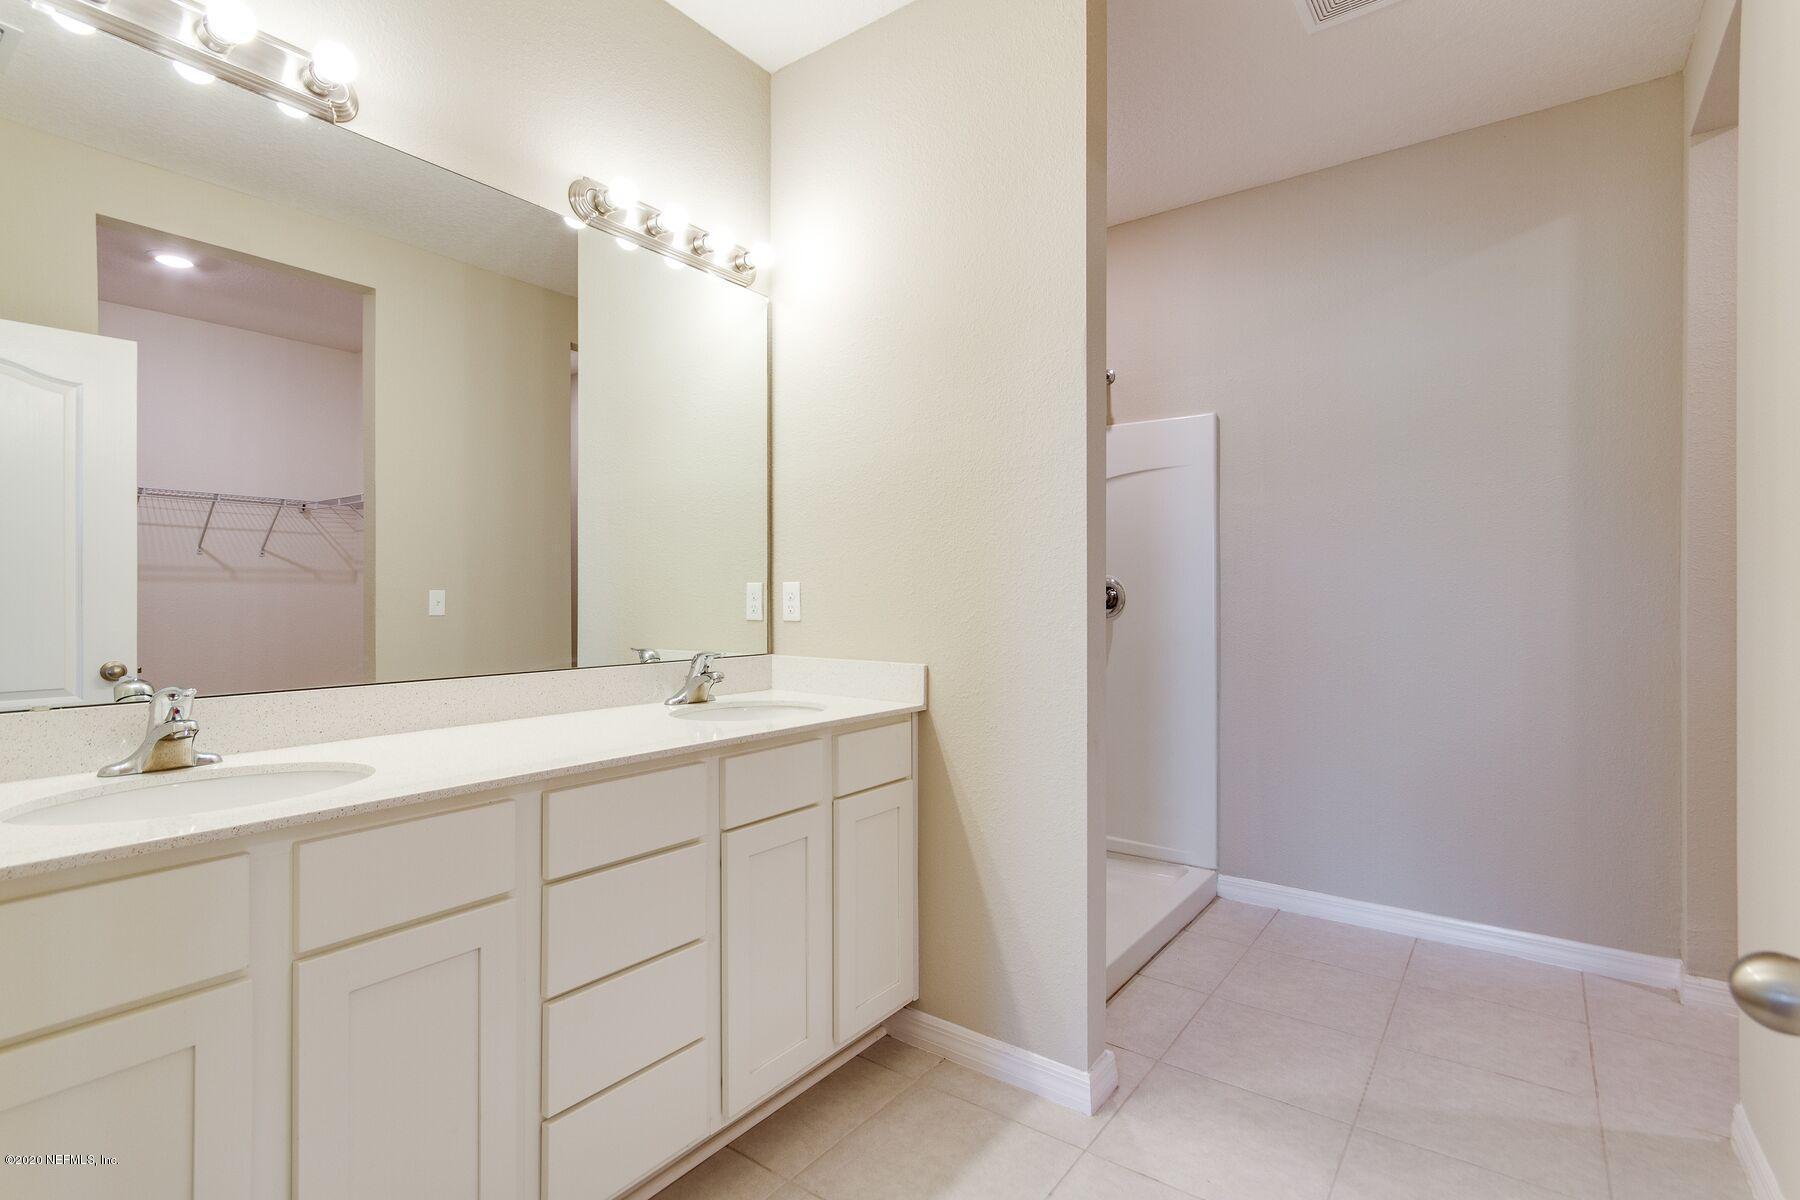 283 FELLBROOK, ST AUGUSTINE, FLORIDA 32095, 4 Bedrooms Bedrooms, ,2 BathroomsBathrooms,Residential,For sale,FELLBROOK,1080102